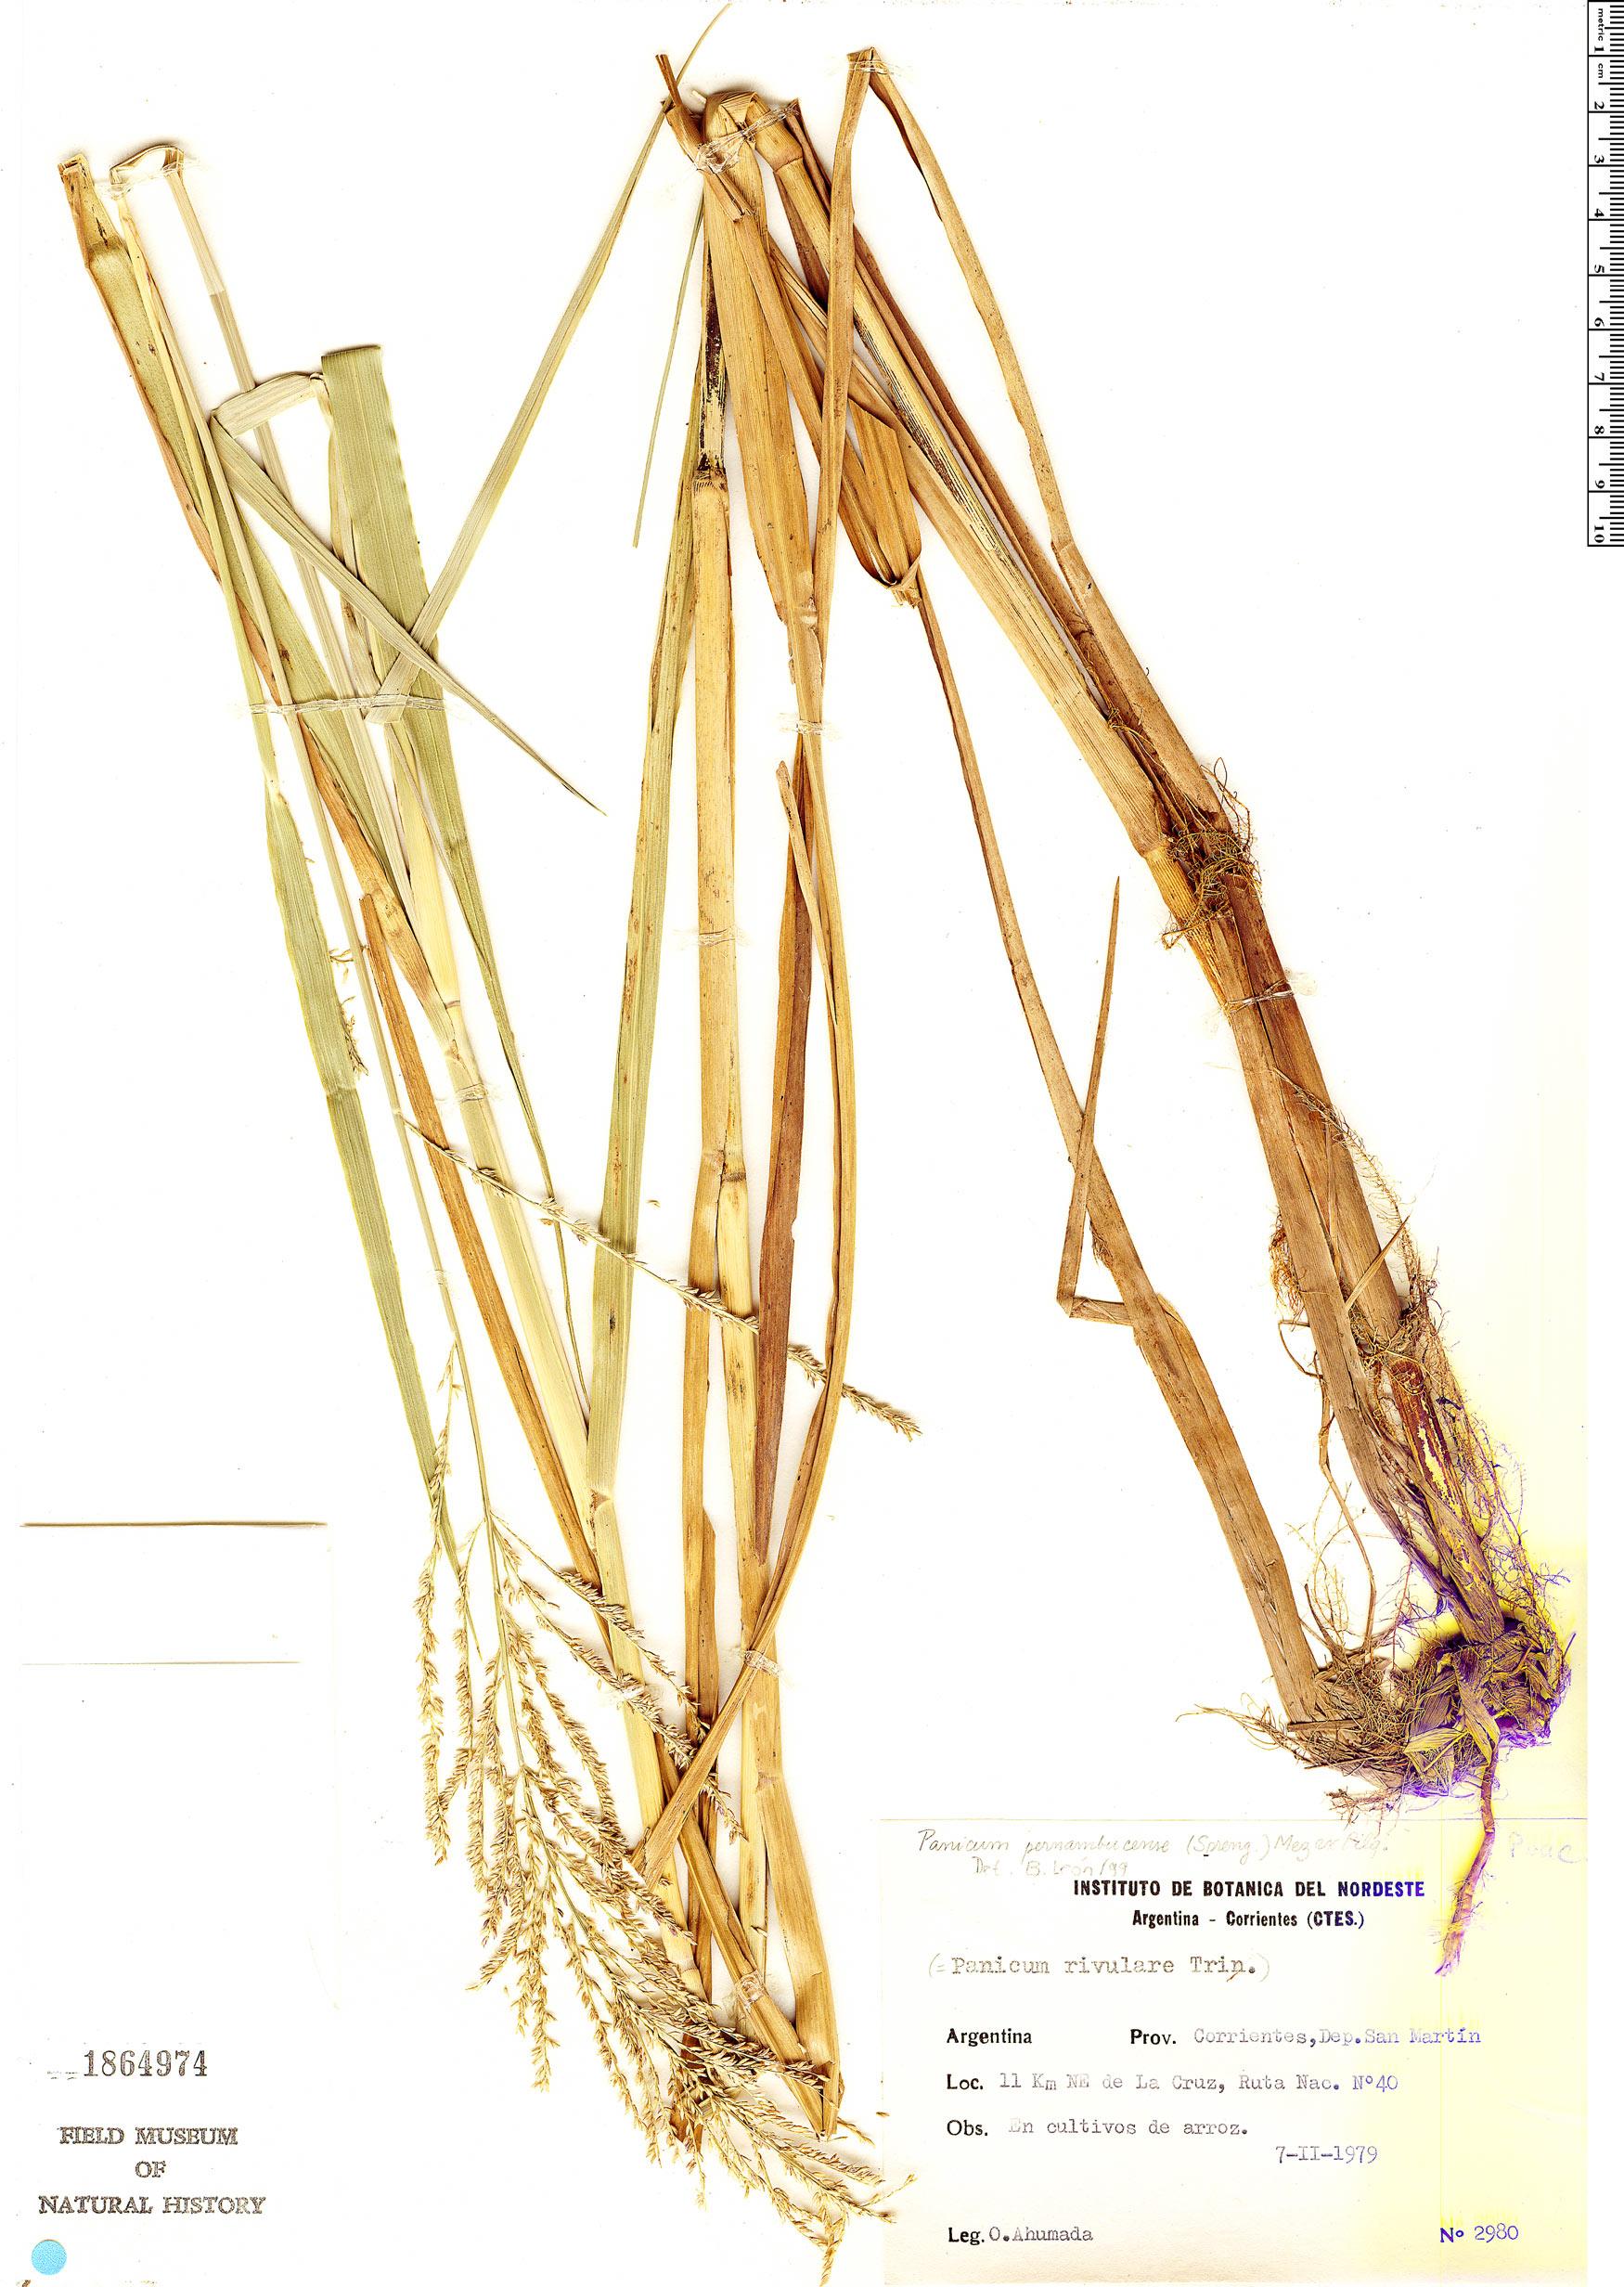 Espécimen: Hymenachne pernambucensis